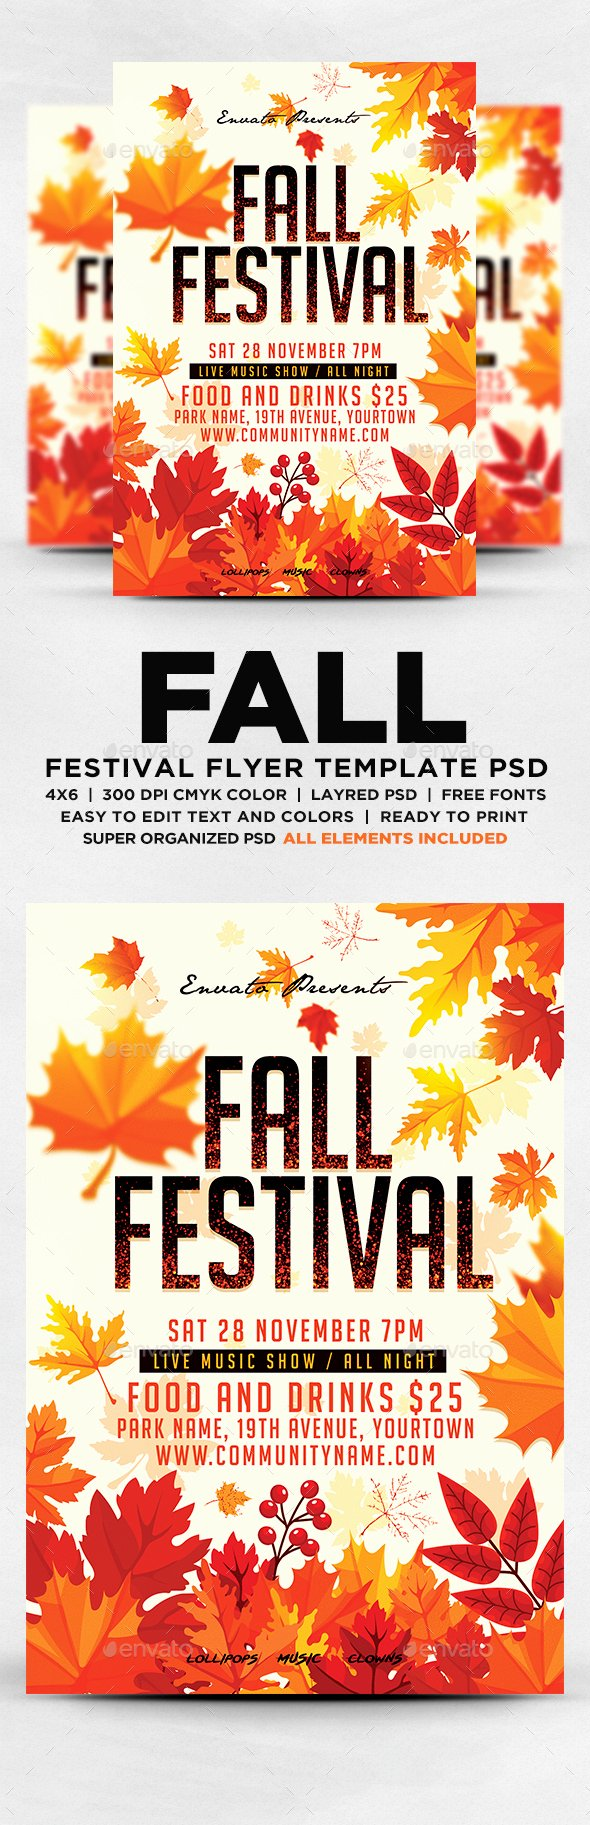 Fall Festival Flyer by Designblend